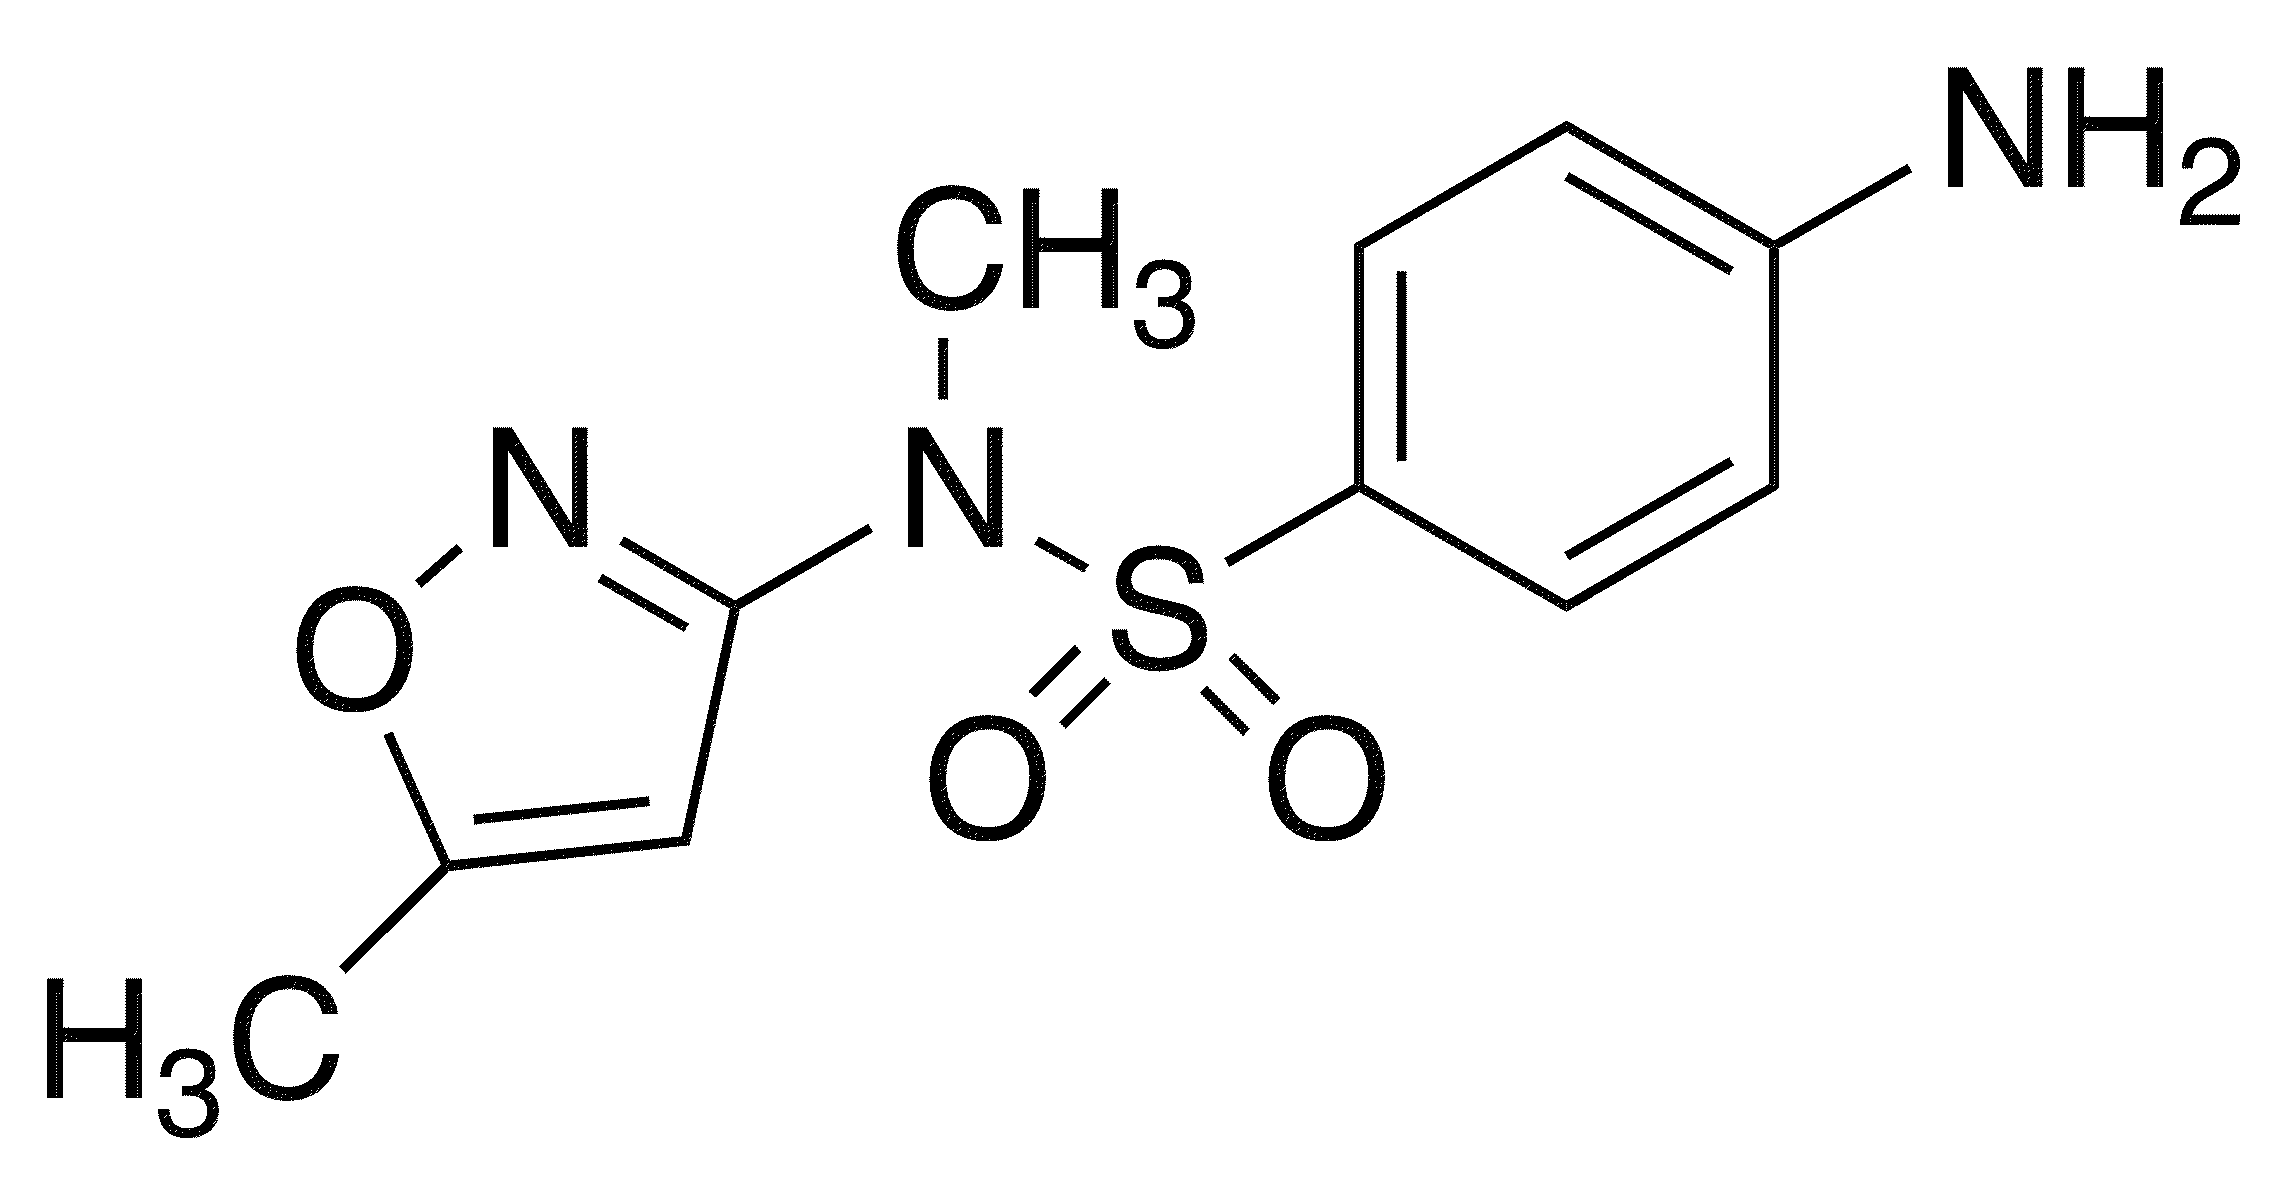 4-Amino-N-methyl-N-(5-methyl-1,2-oxazol-3-yl)benzenesulfonamide